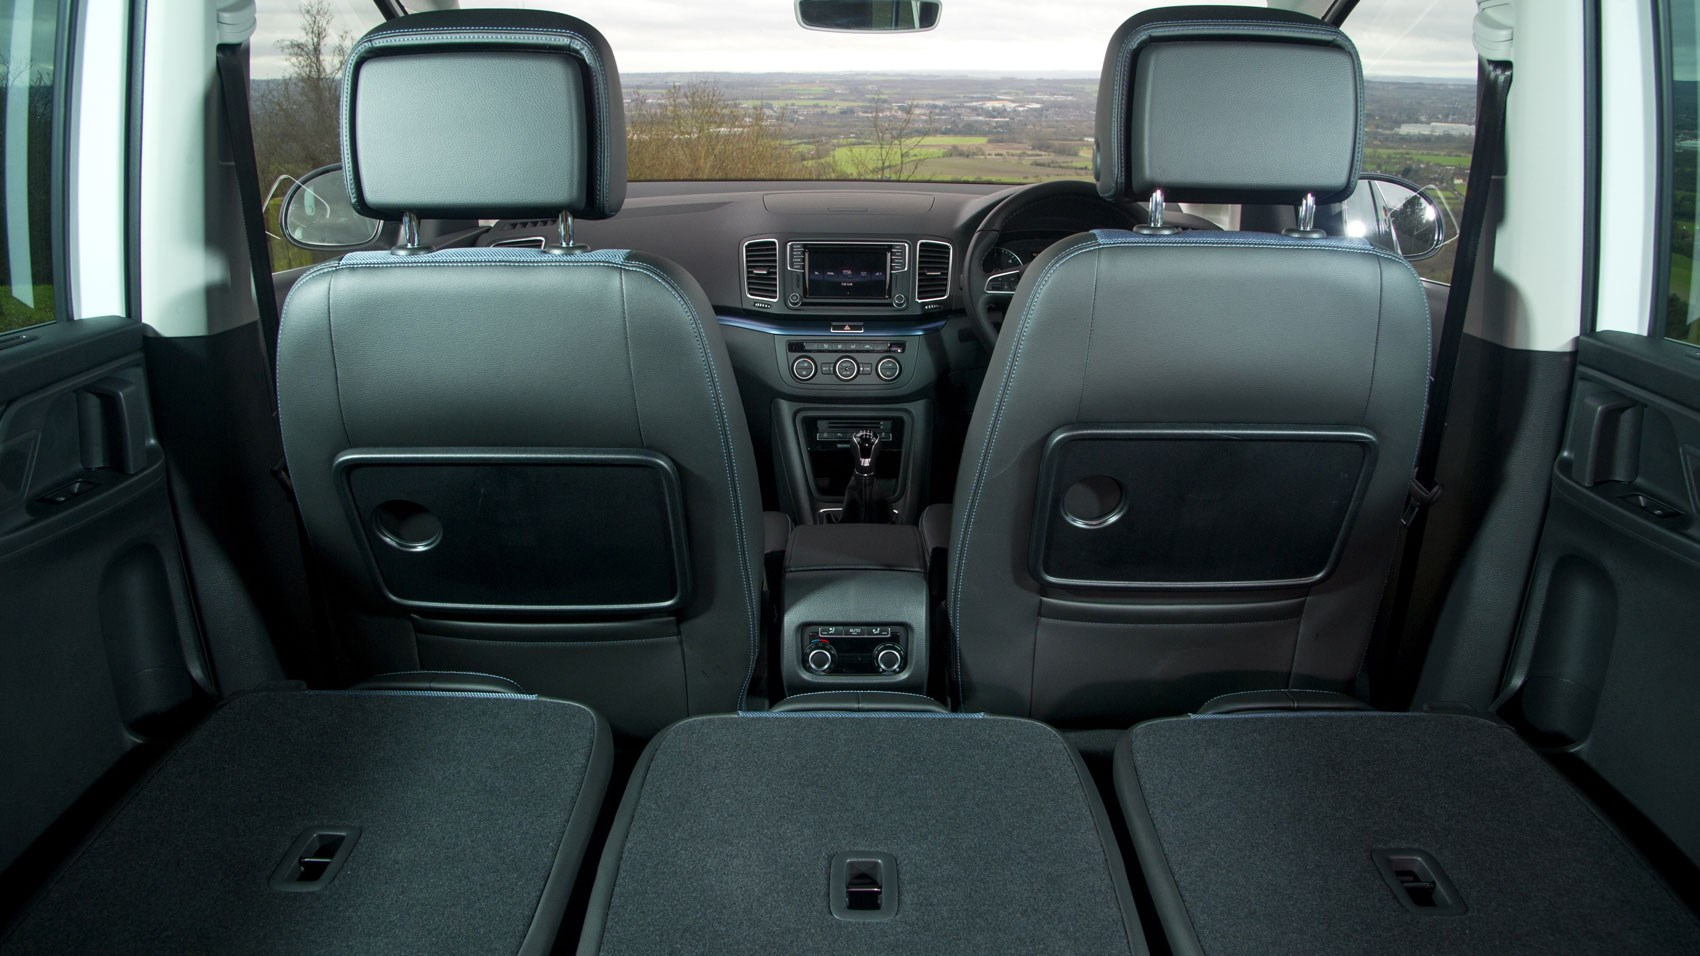 Car Giant Seat Alhambra